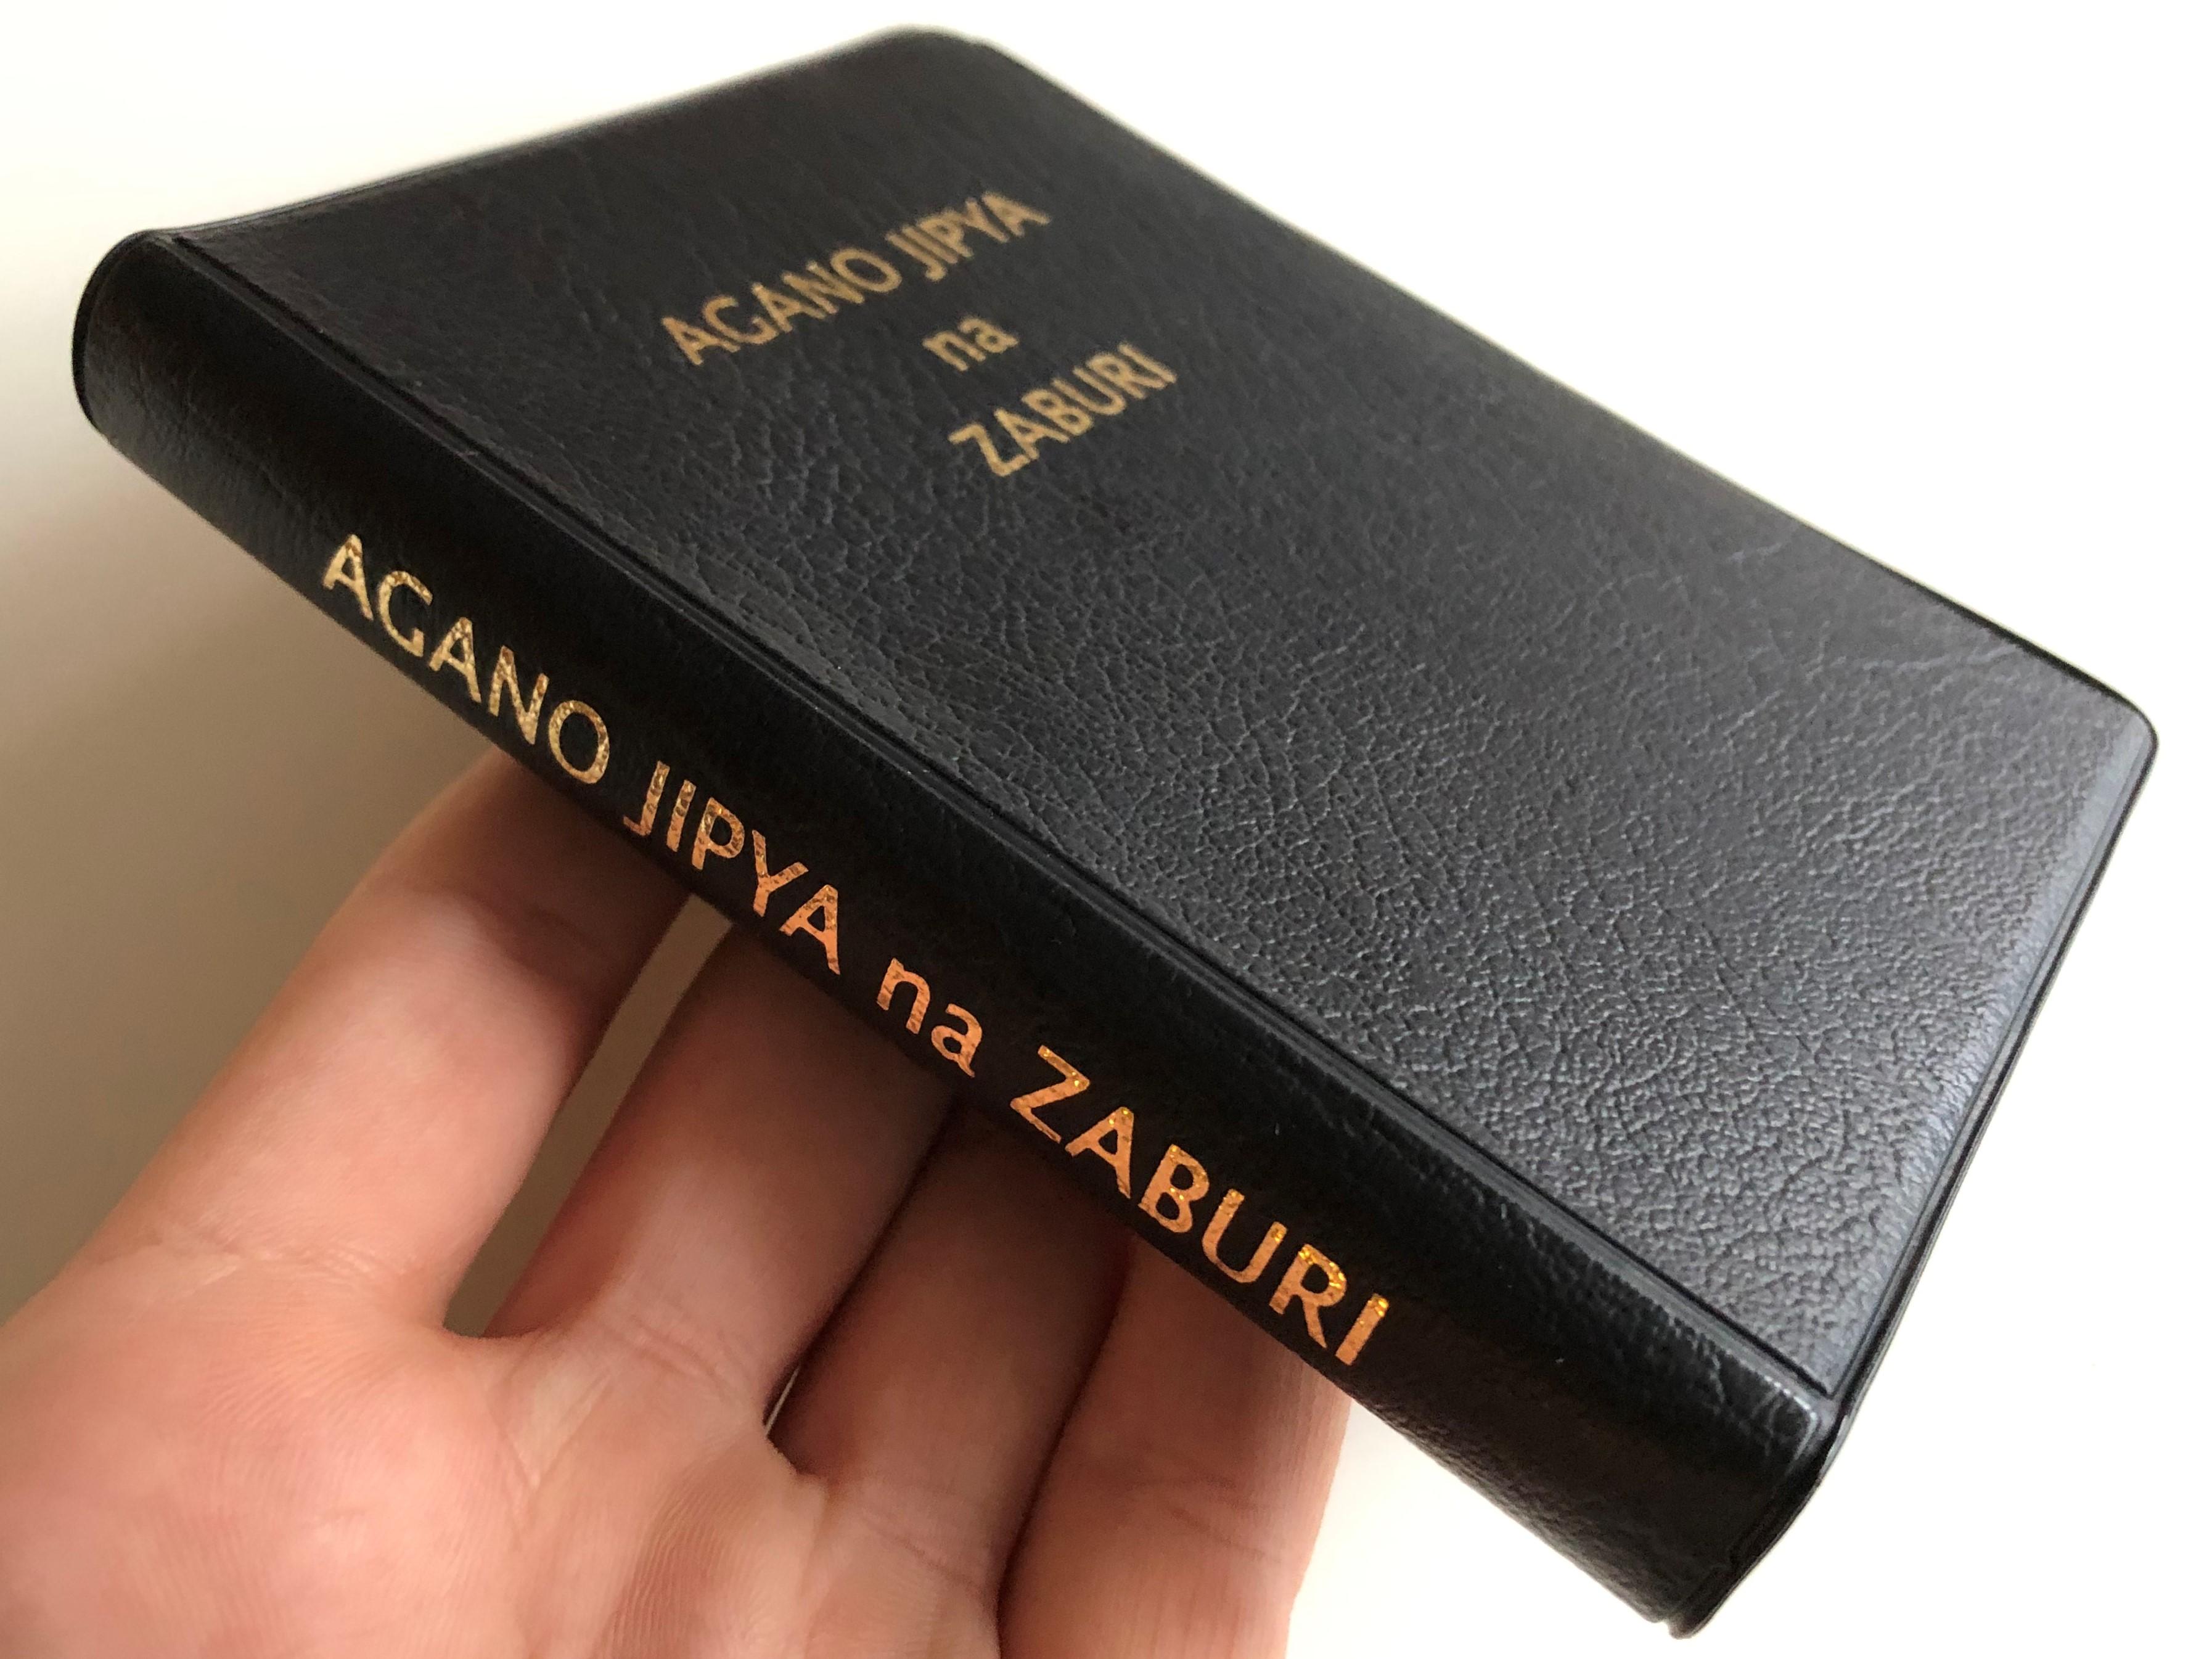 kiswahili-new-testament-psalms-agano-jipya-na-zaburi-4.jpg